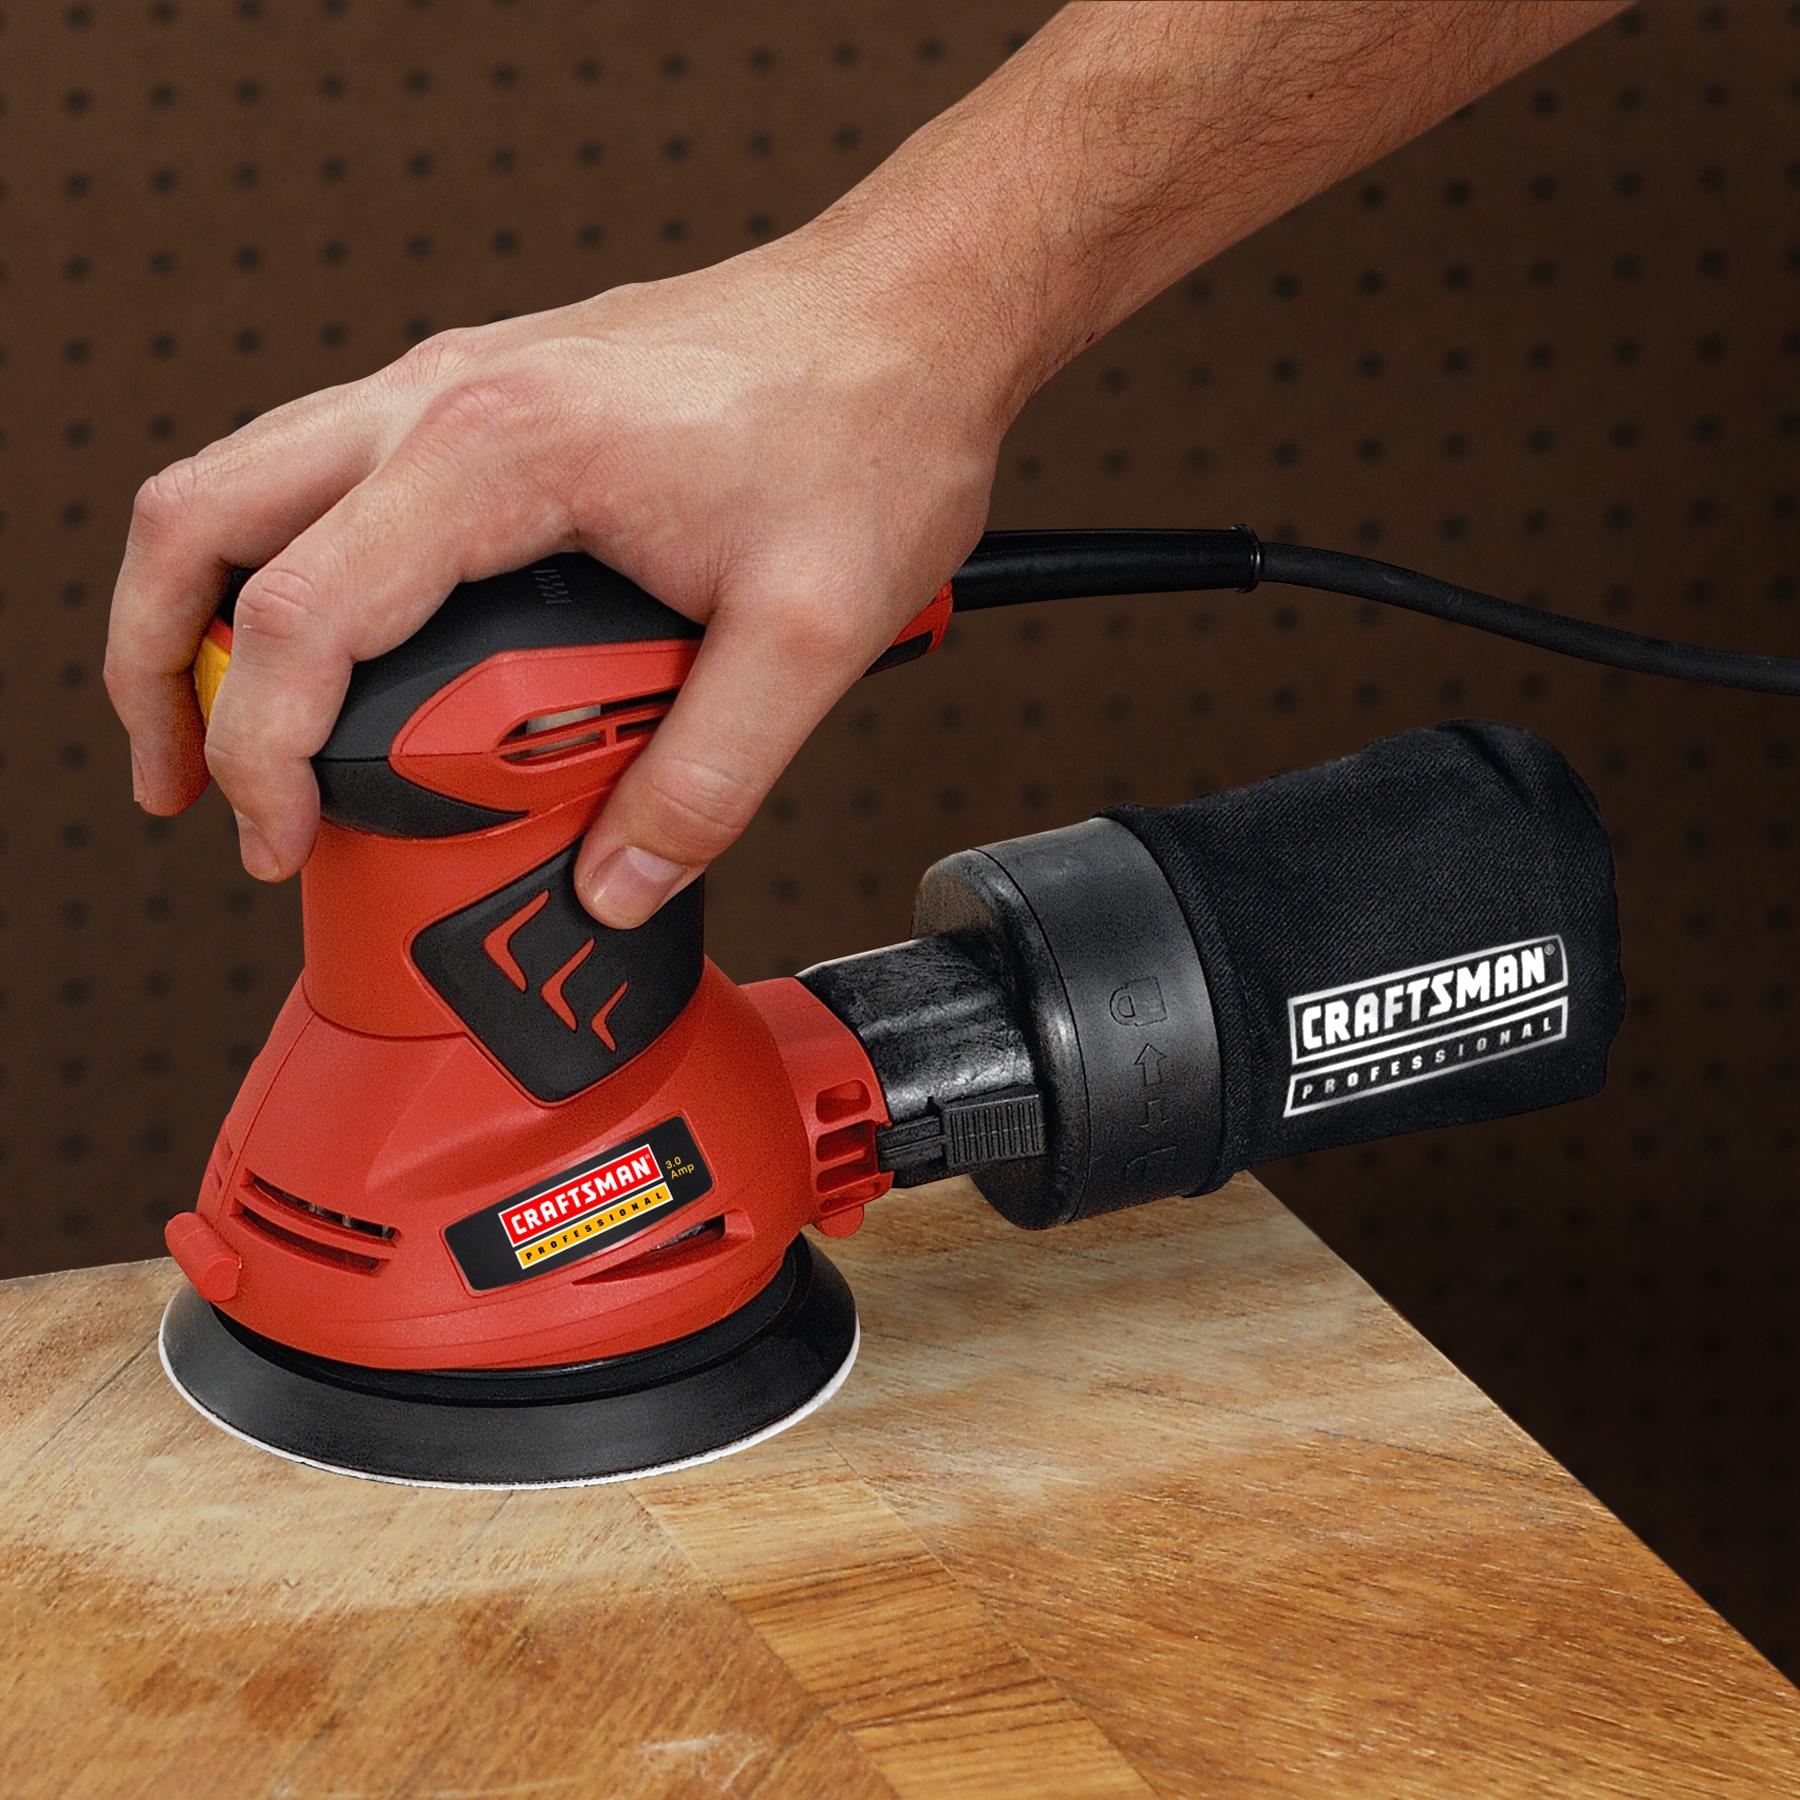 "Craftsman Professional 27675 3.0 amp Corded 5"" Random Orbit Sander"